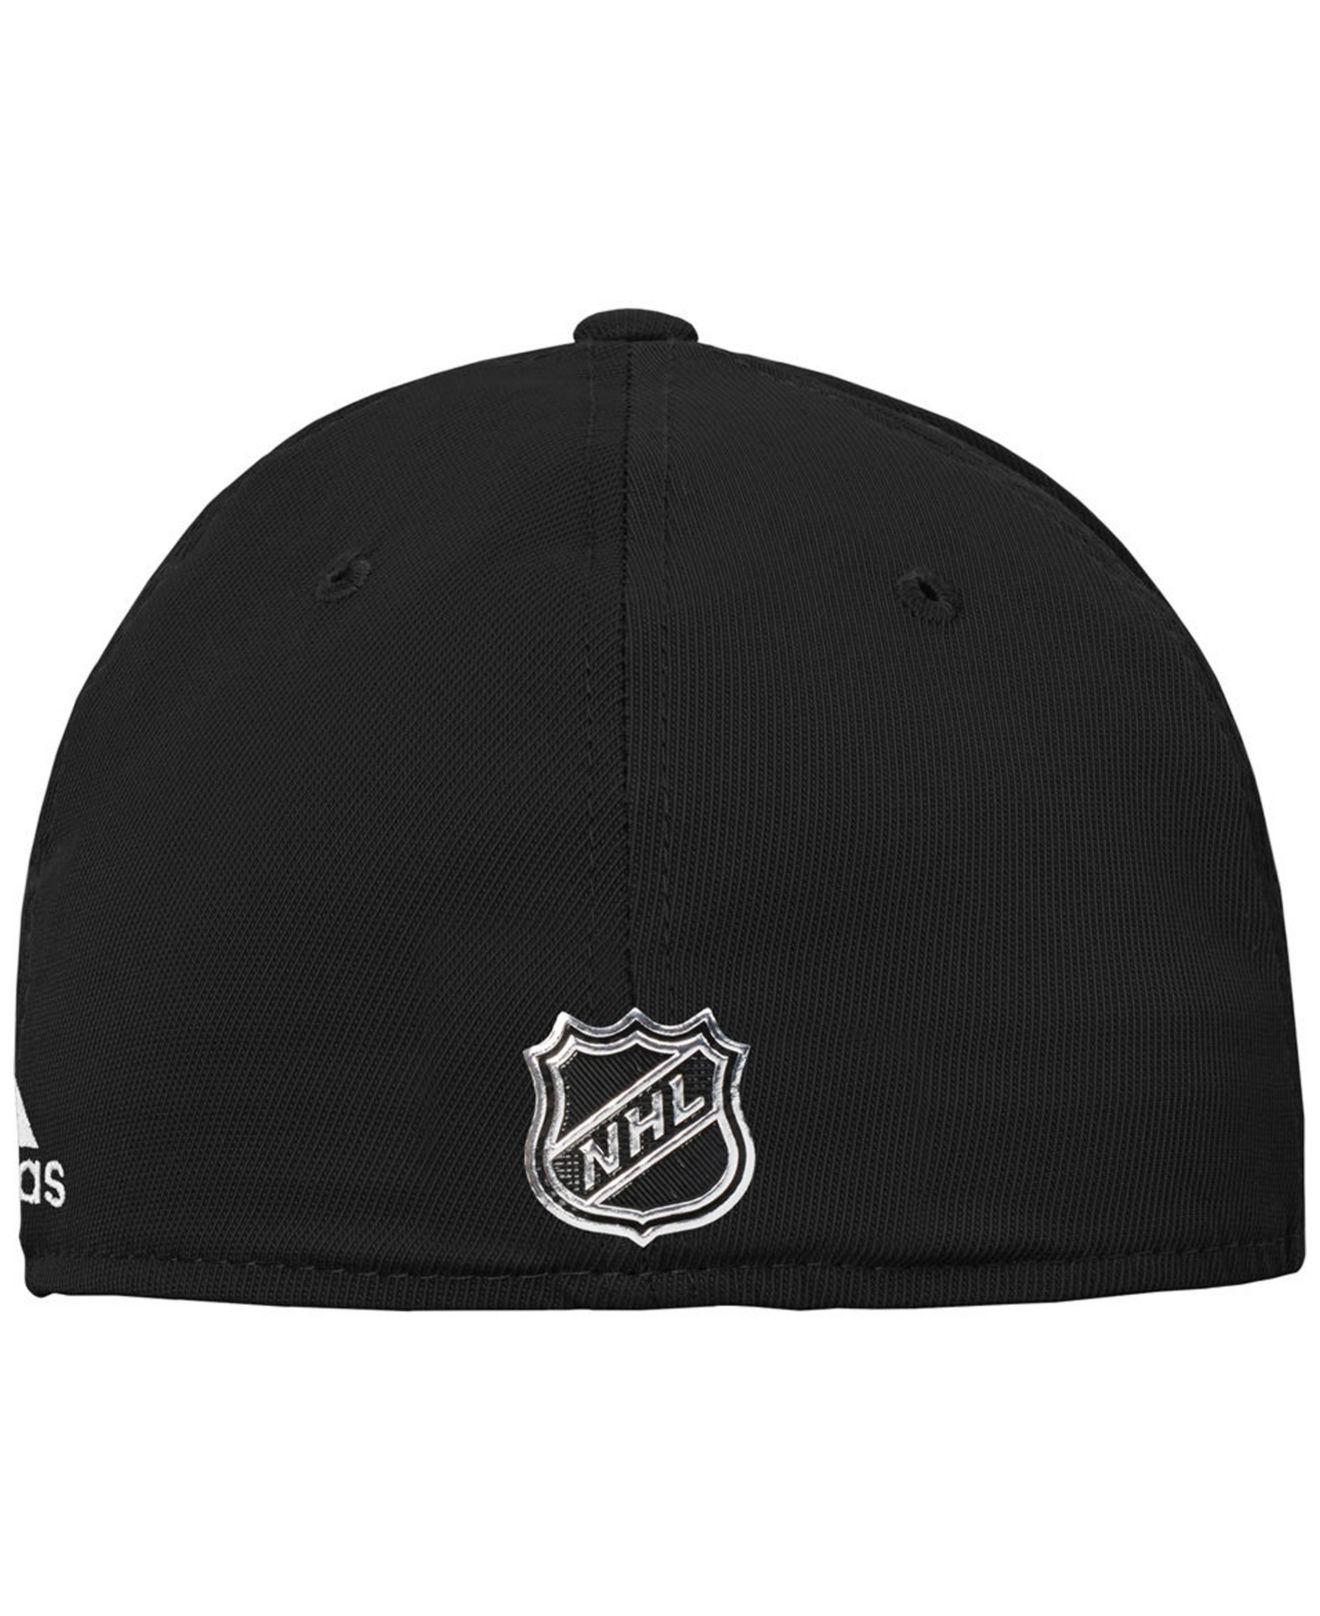 new styles 015e2 38169 ... get lyst adidas los angeles kings 2nd season flex cap in black for men  b4b06 dcc9d